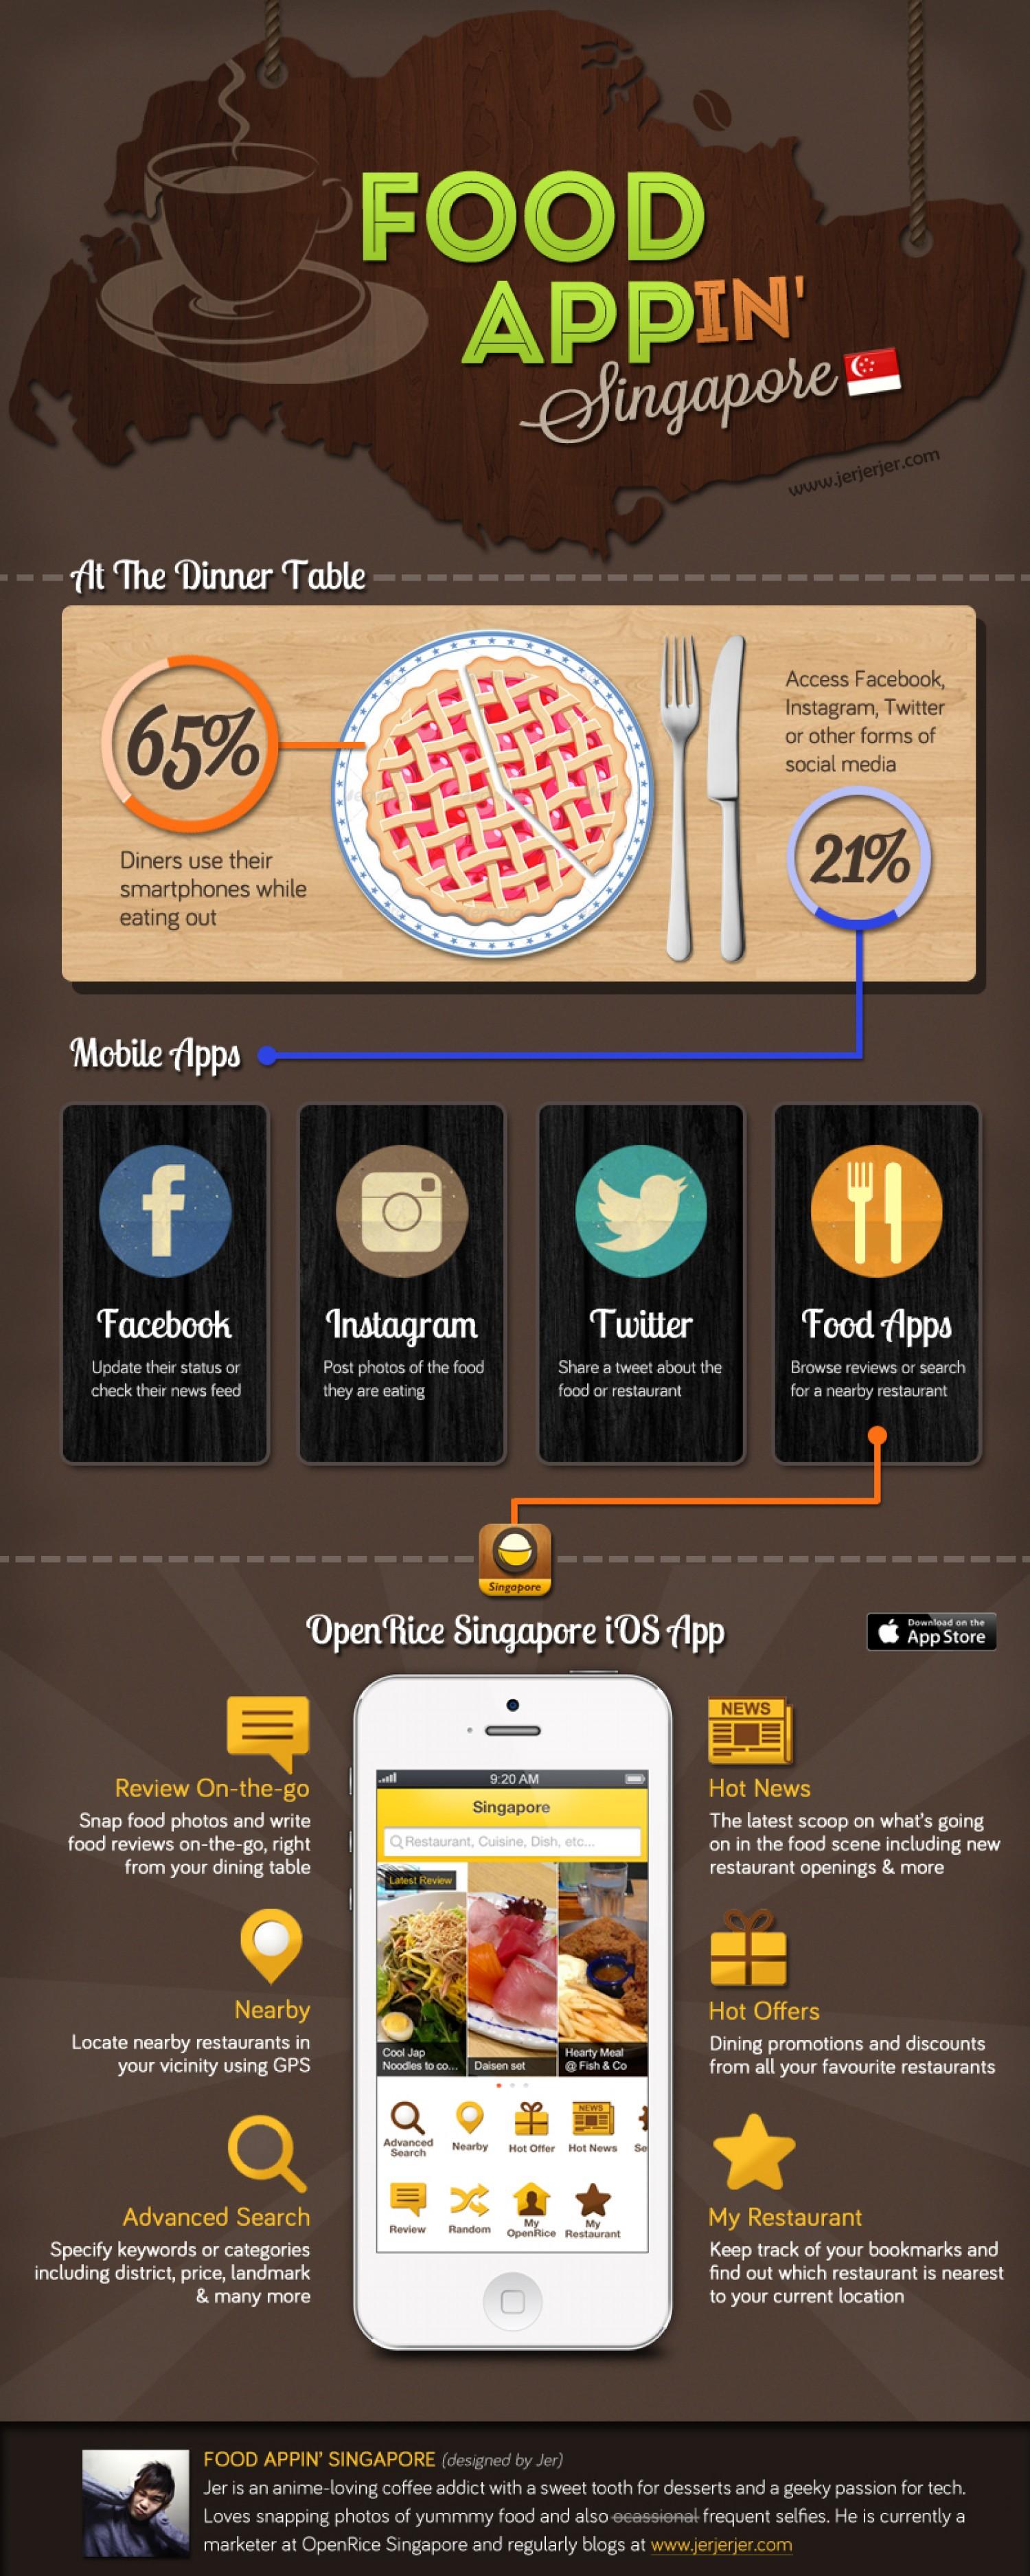 16. Food App in Singapore